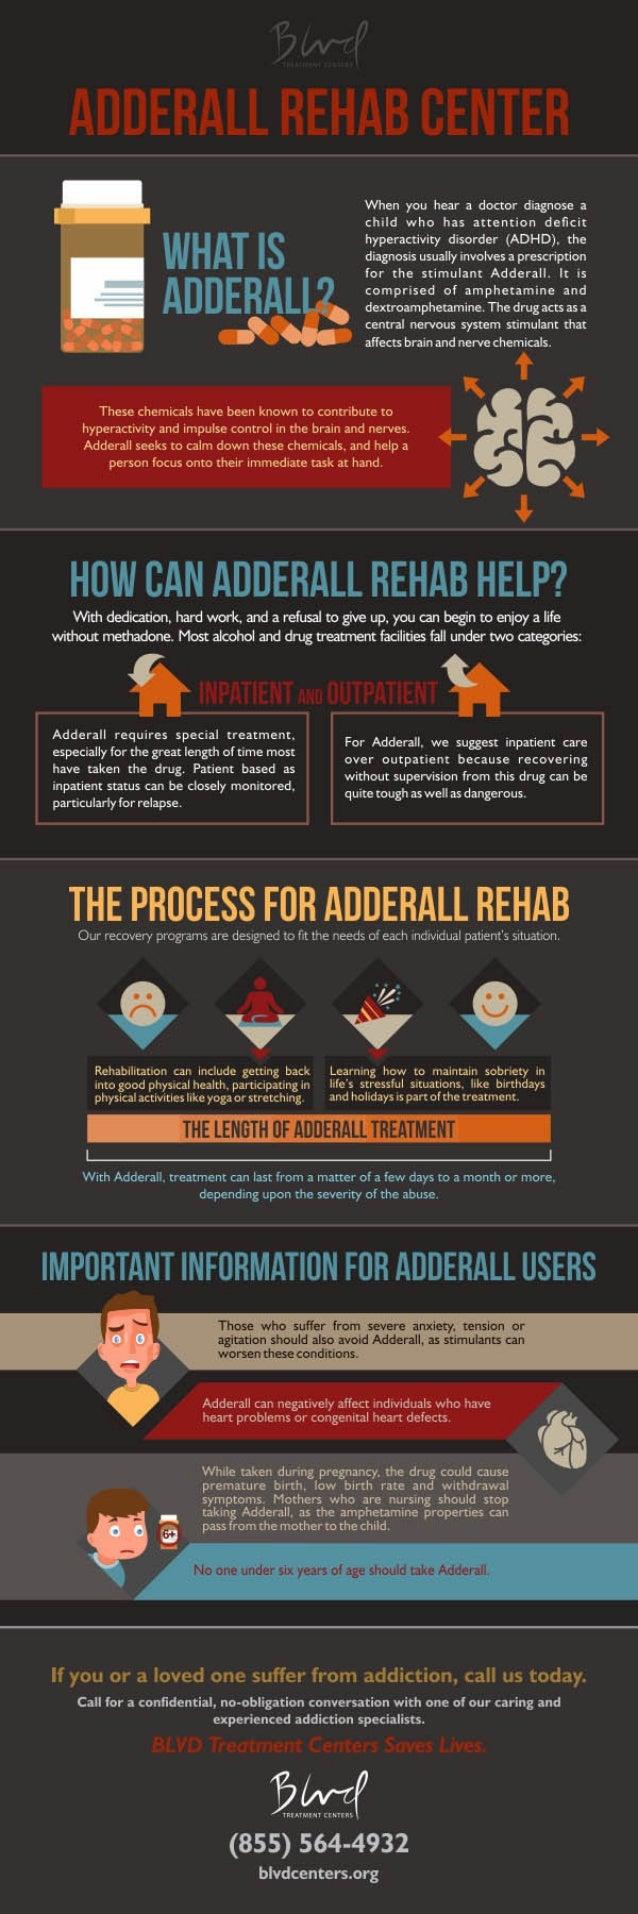 Adderall rehab center inpatient outpatient blvd treatment